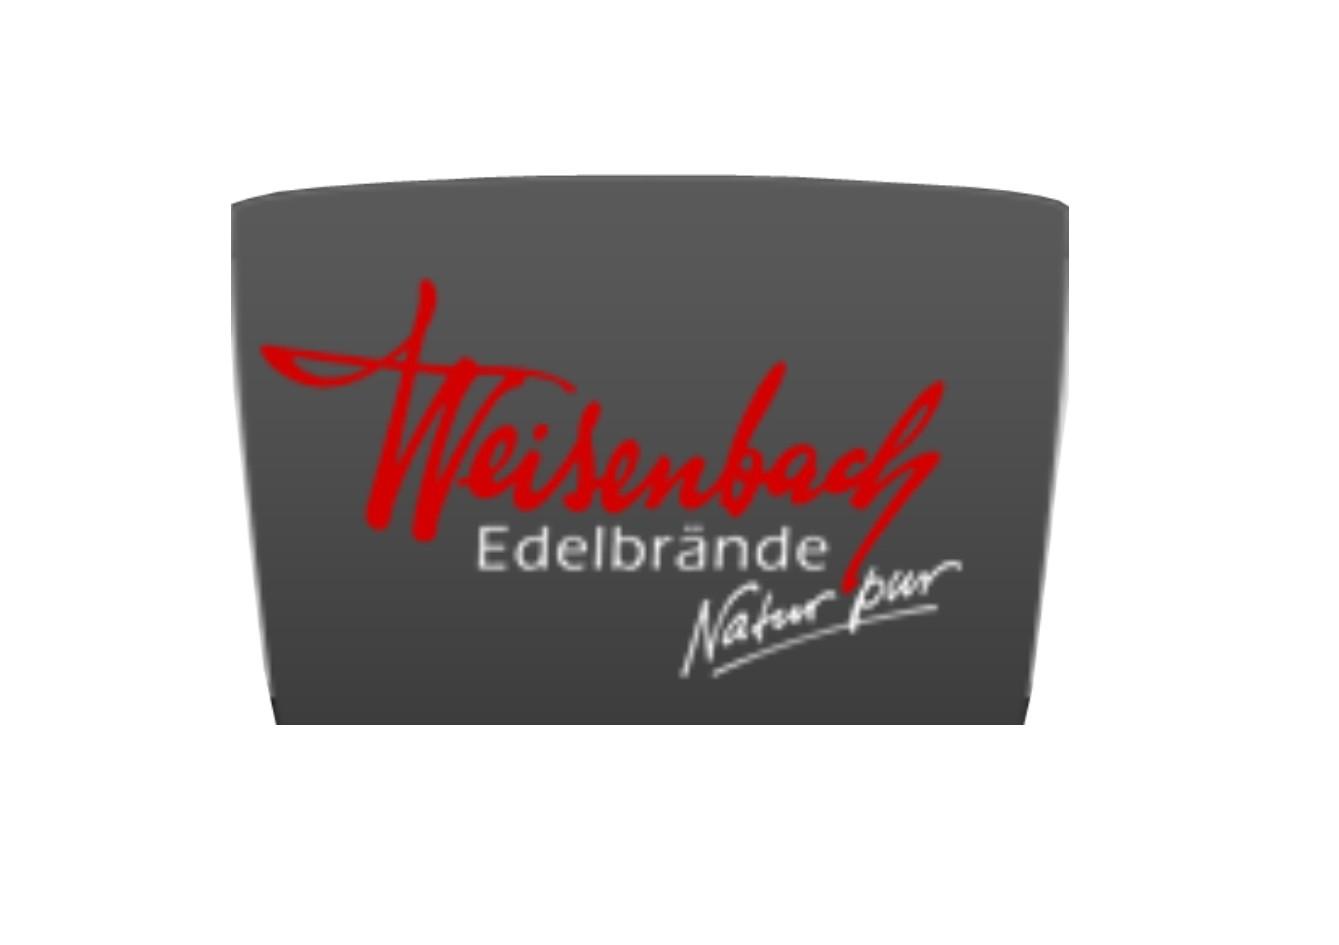 Weisenbach